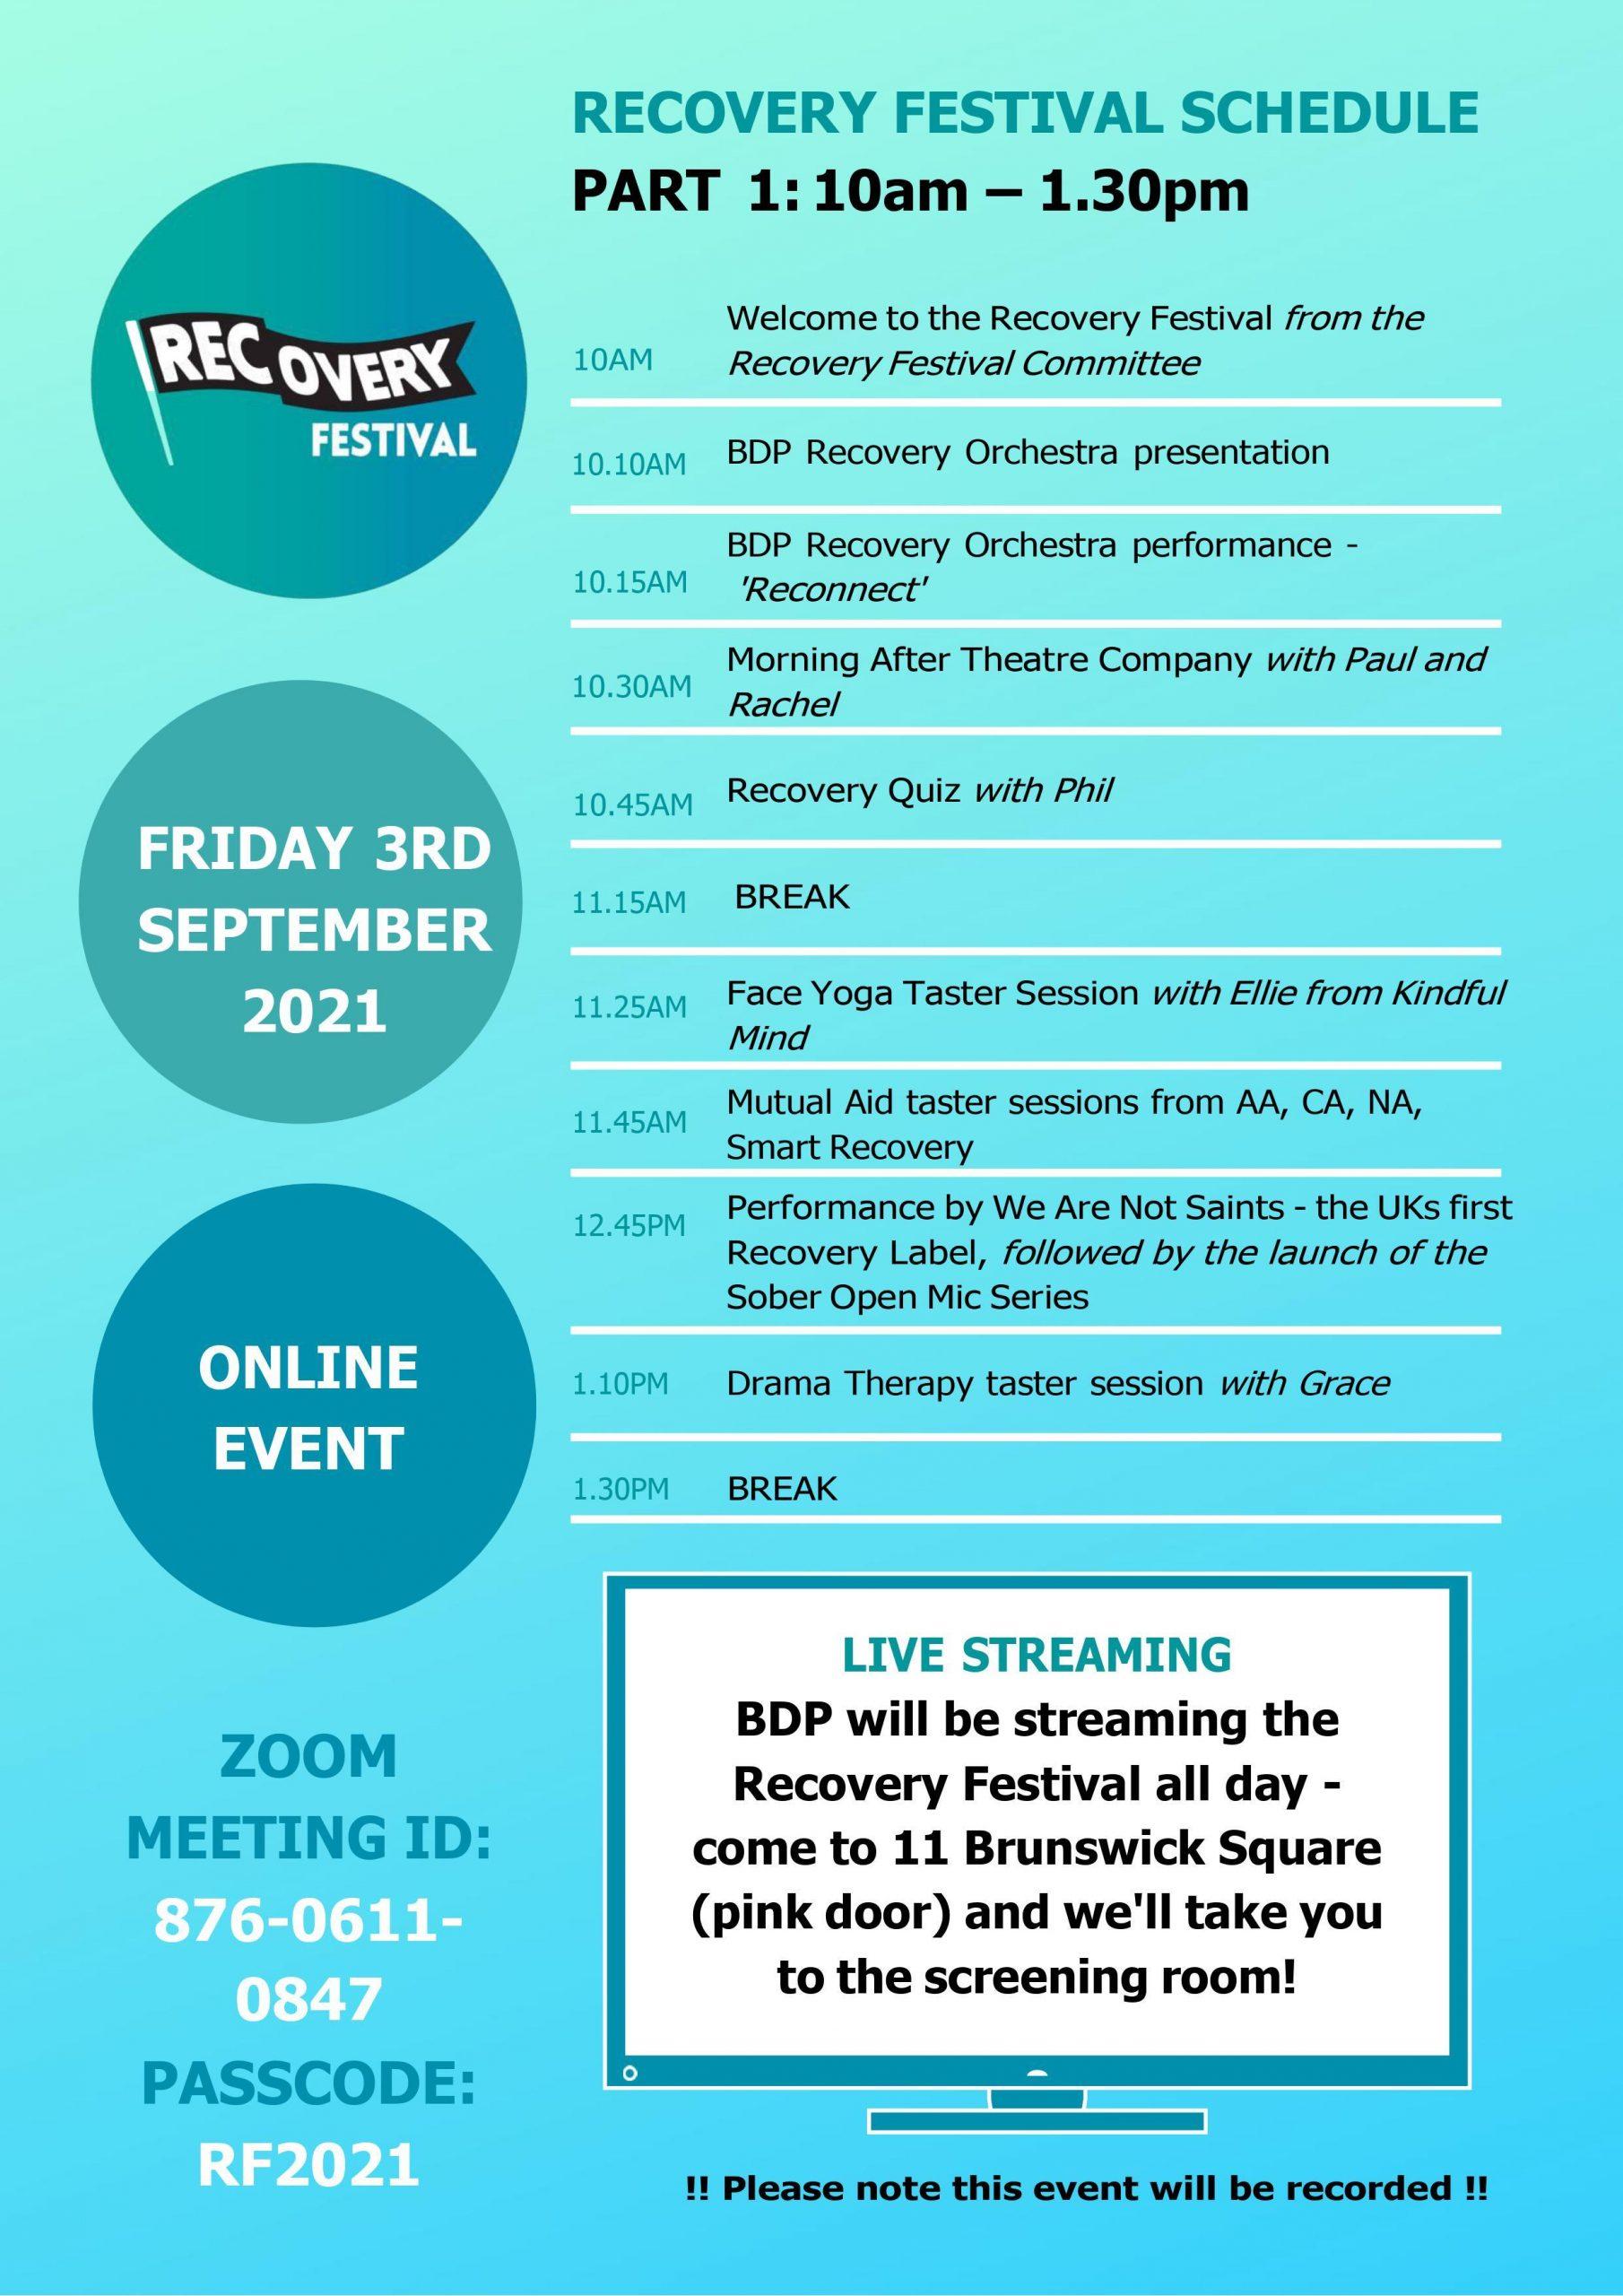 Bristol Recovery Festival Schedule 2021